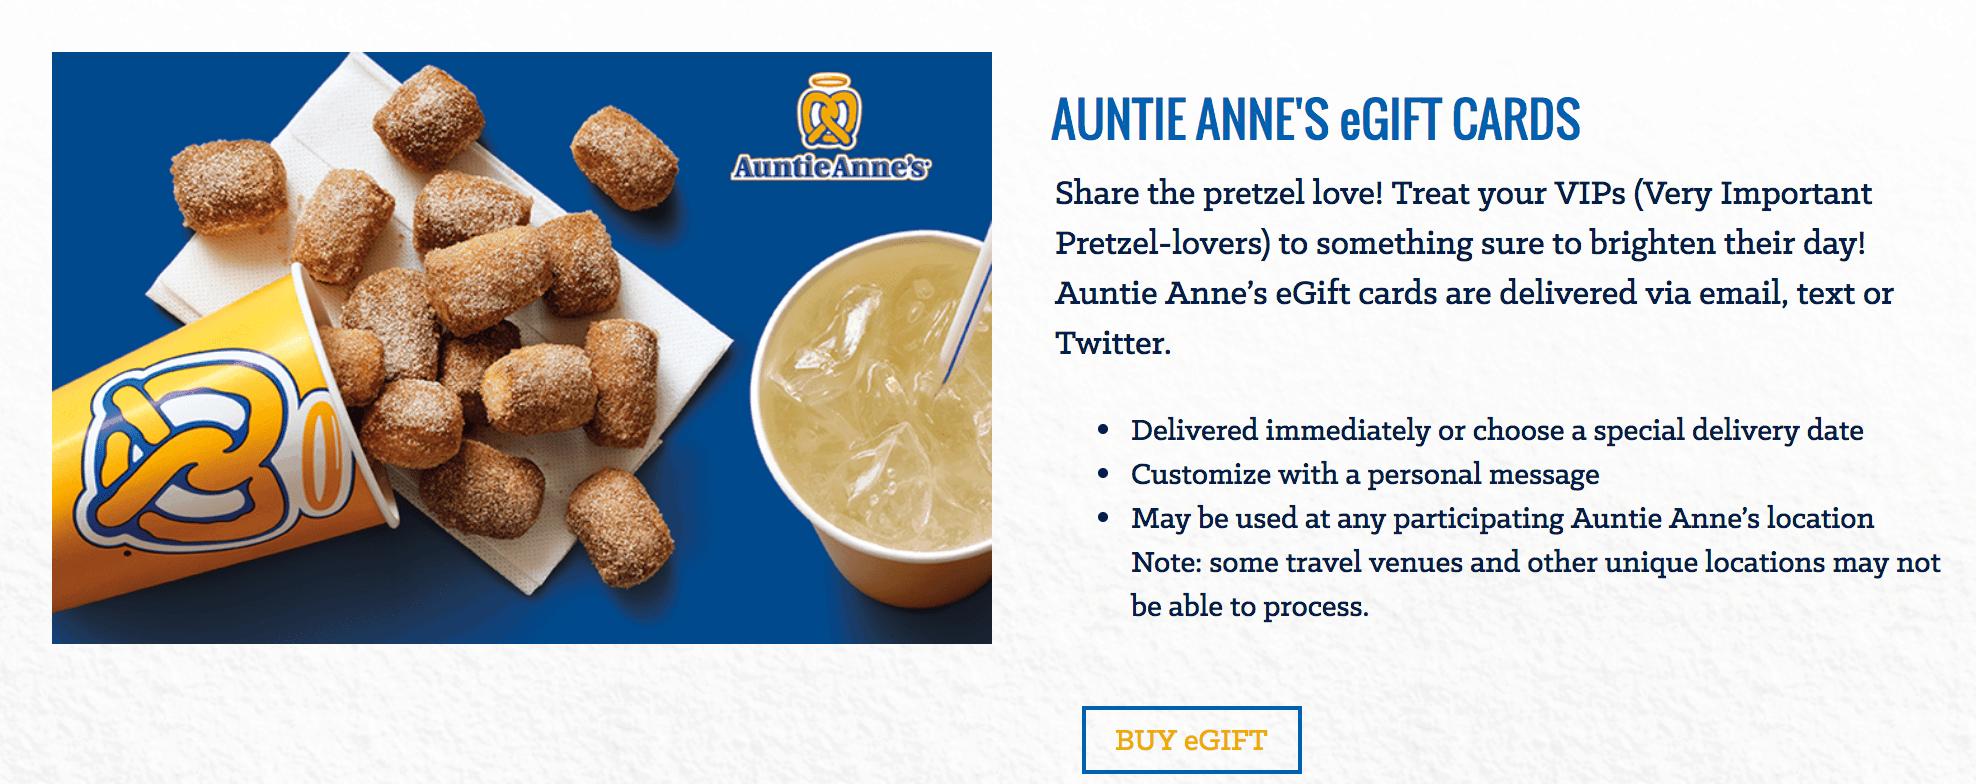 Auntie Anne's gift card service